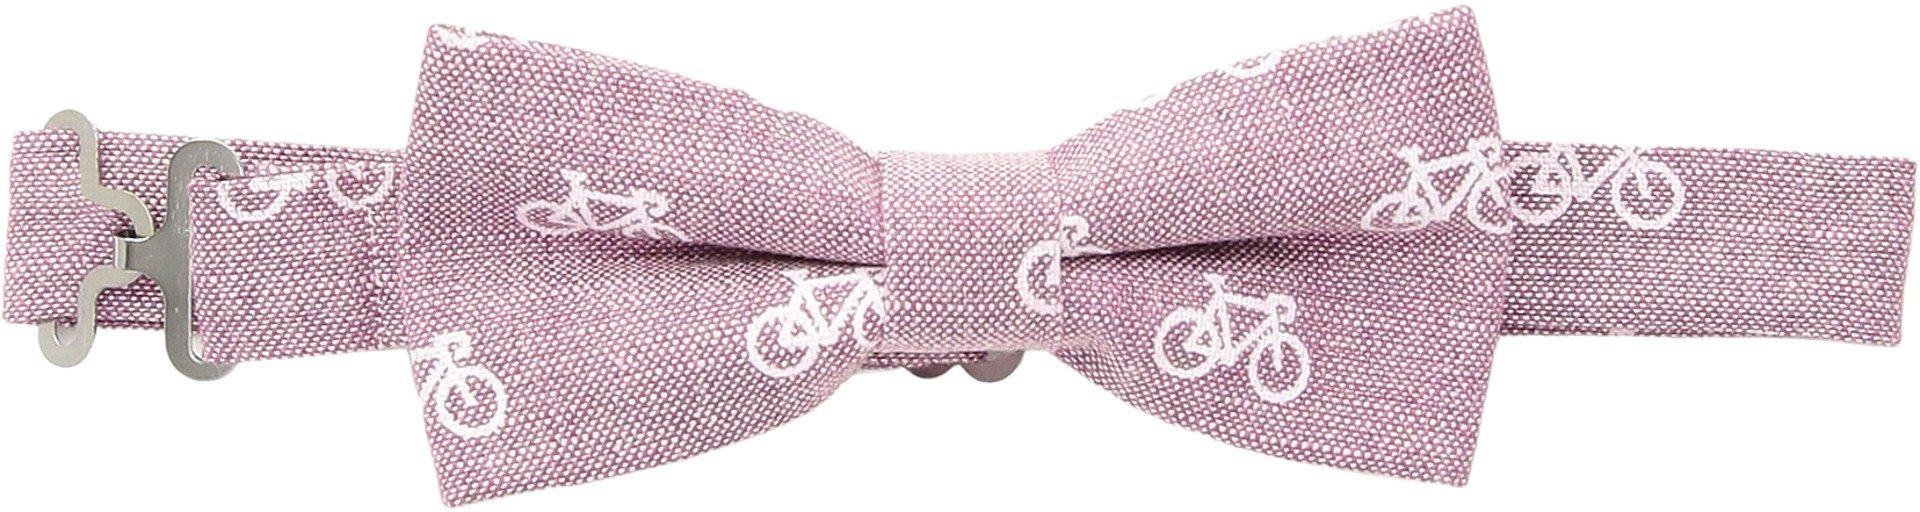 Appaman Kids  Baby Boy's Bow Tie (Toddler/Little Kids/Big Kids) Raspberry Bikes One Size